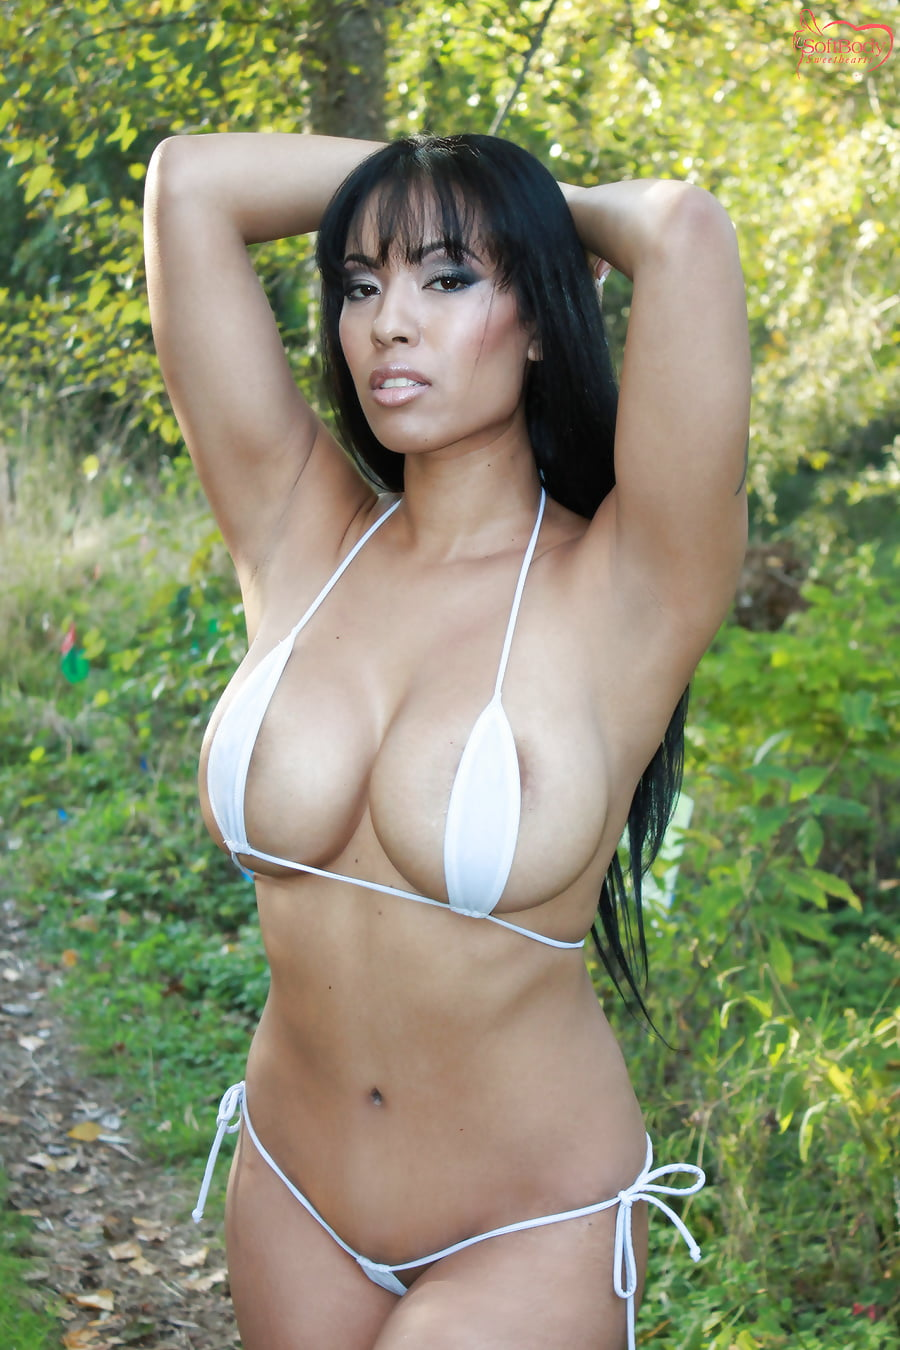 mckay-porn-busty-latina-babes-nude-woman-likes-sex